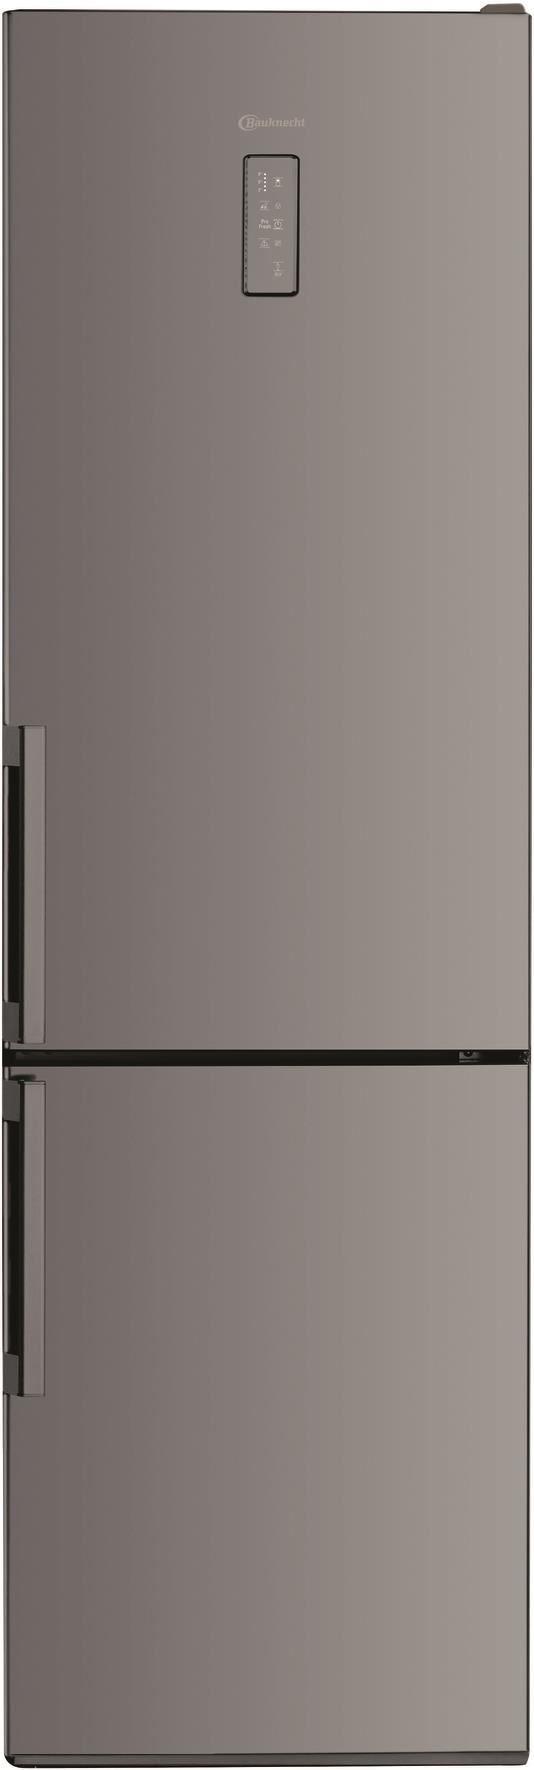 bauknecht kgnf 185 a2 in nofrost k hl gefrierkombi fridges freezers computeruniverse. Black Bedroom Furniture Sets. Home Design Ideas